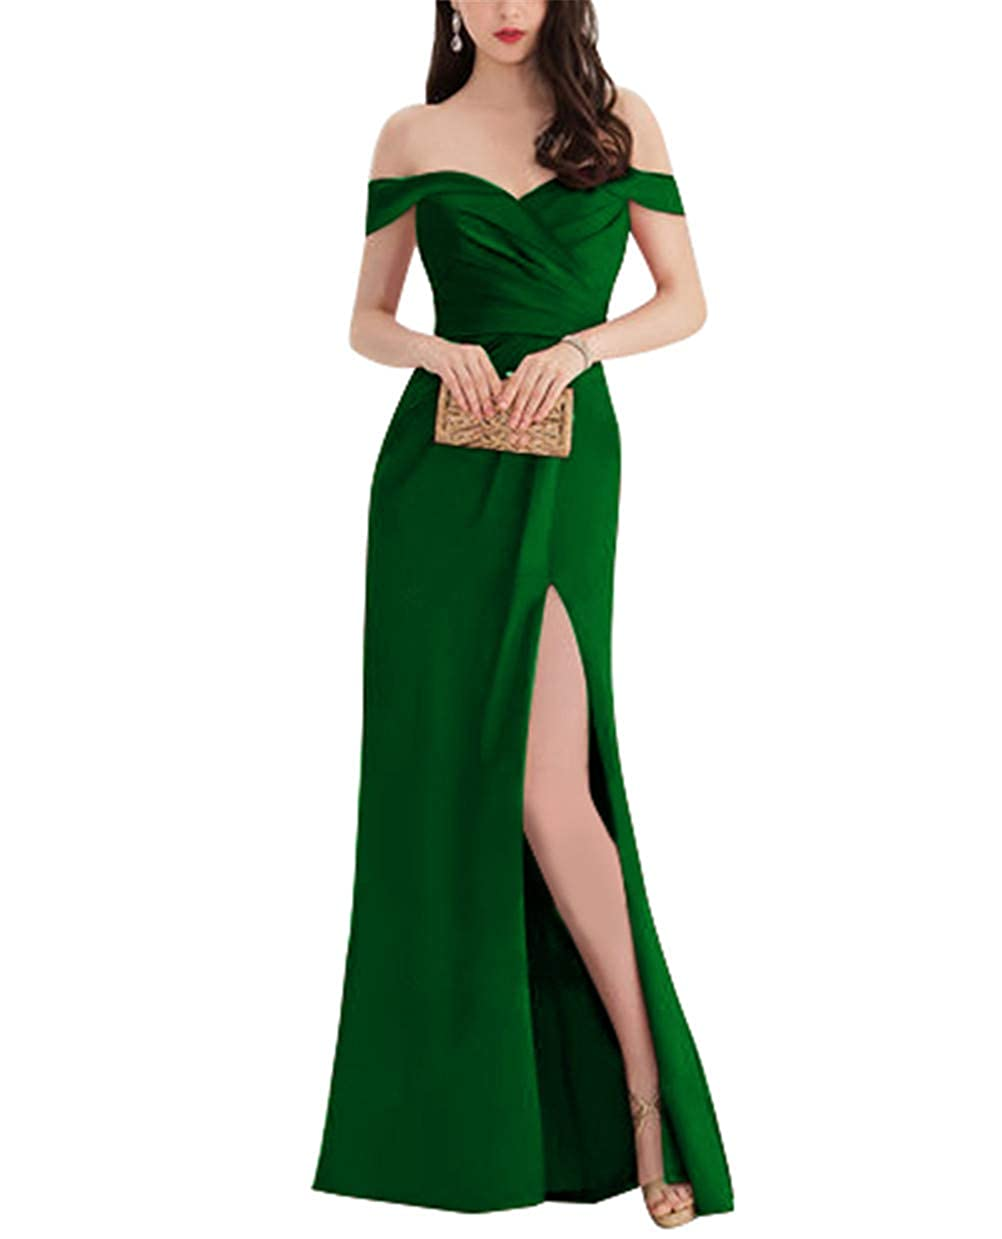 Dark Green Homecy Split Off Shoulder Prom Dress for Women Mermaid Long Satin Formal Evening Gowns